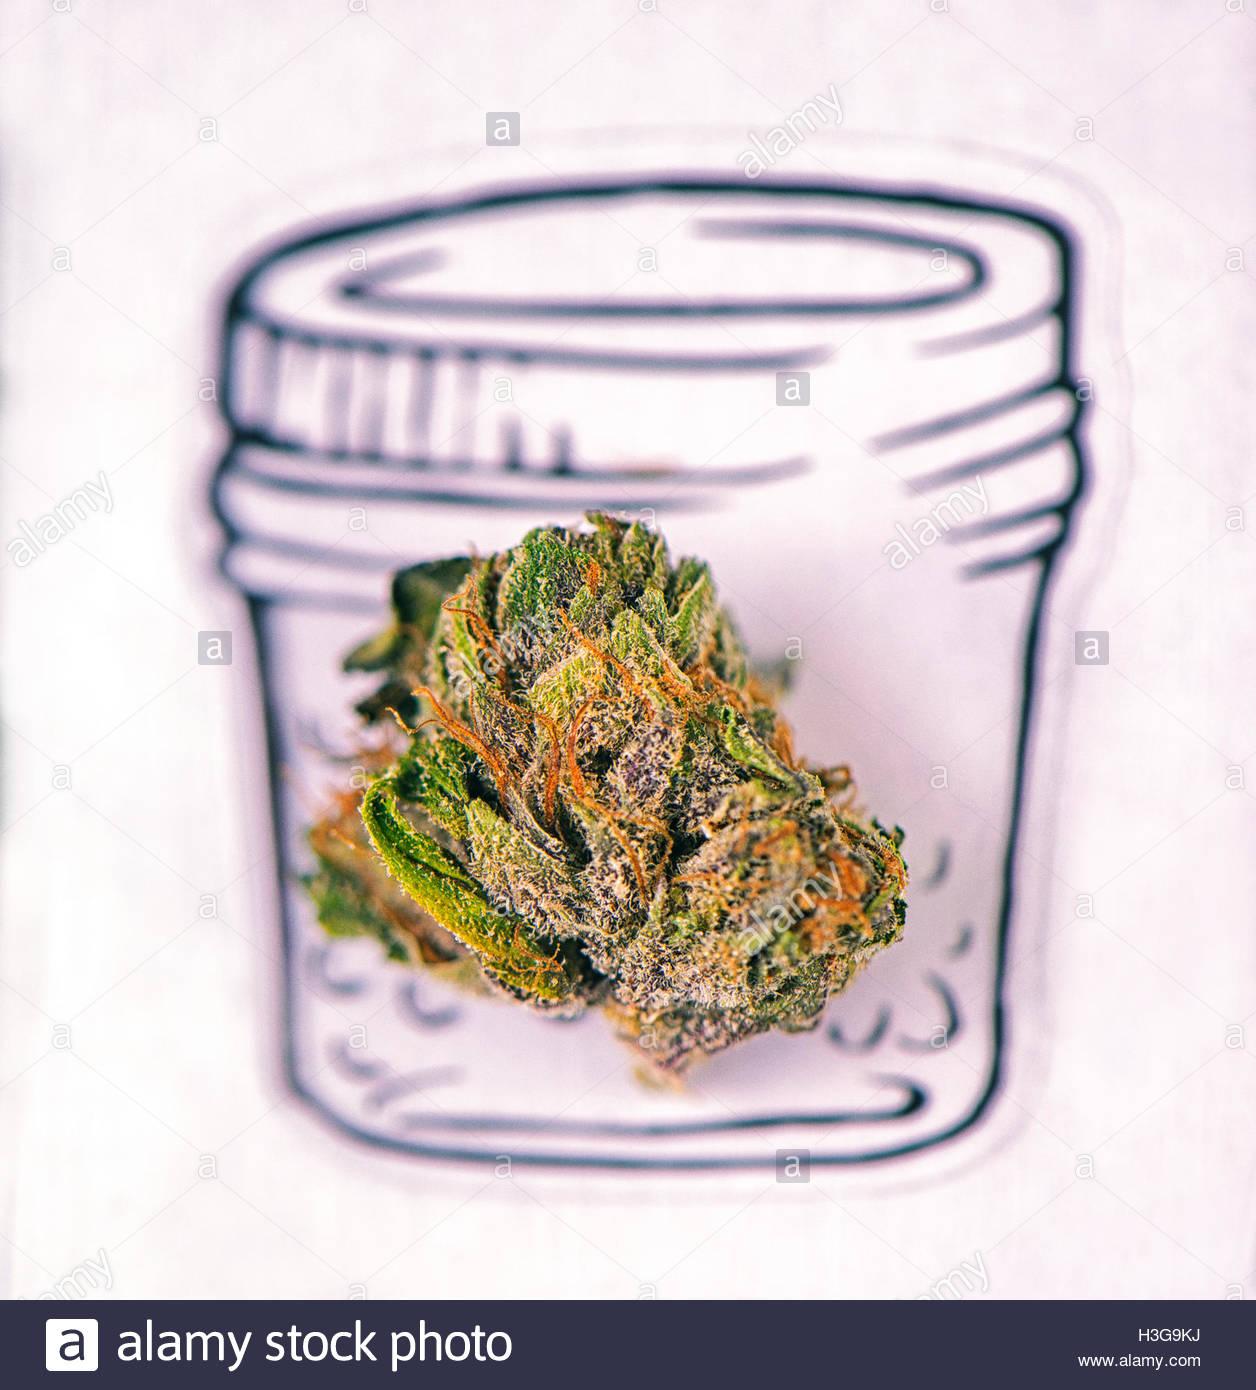 1256x1390 Dried Cannabis (Marijuana) Bud Macro Over A Jar Drawing On White